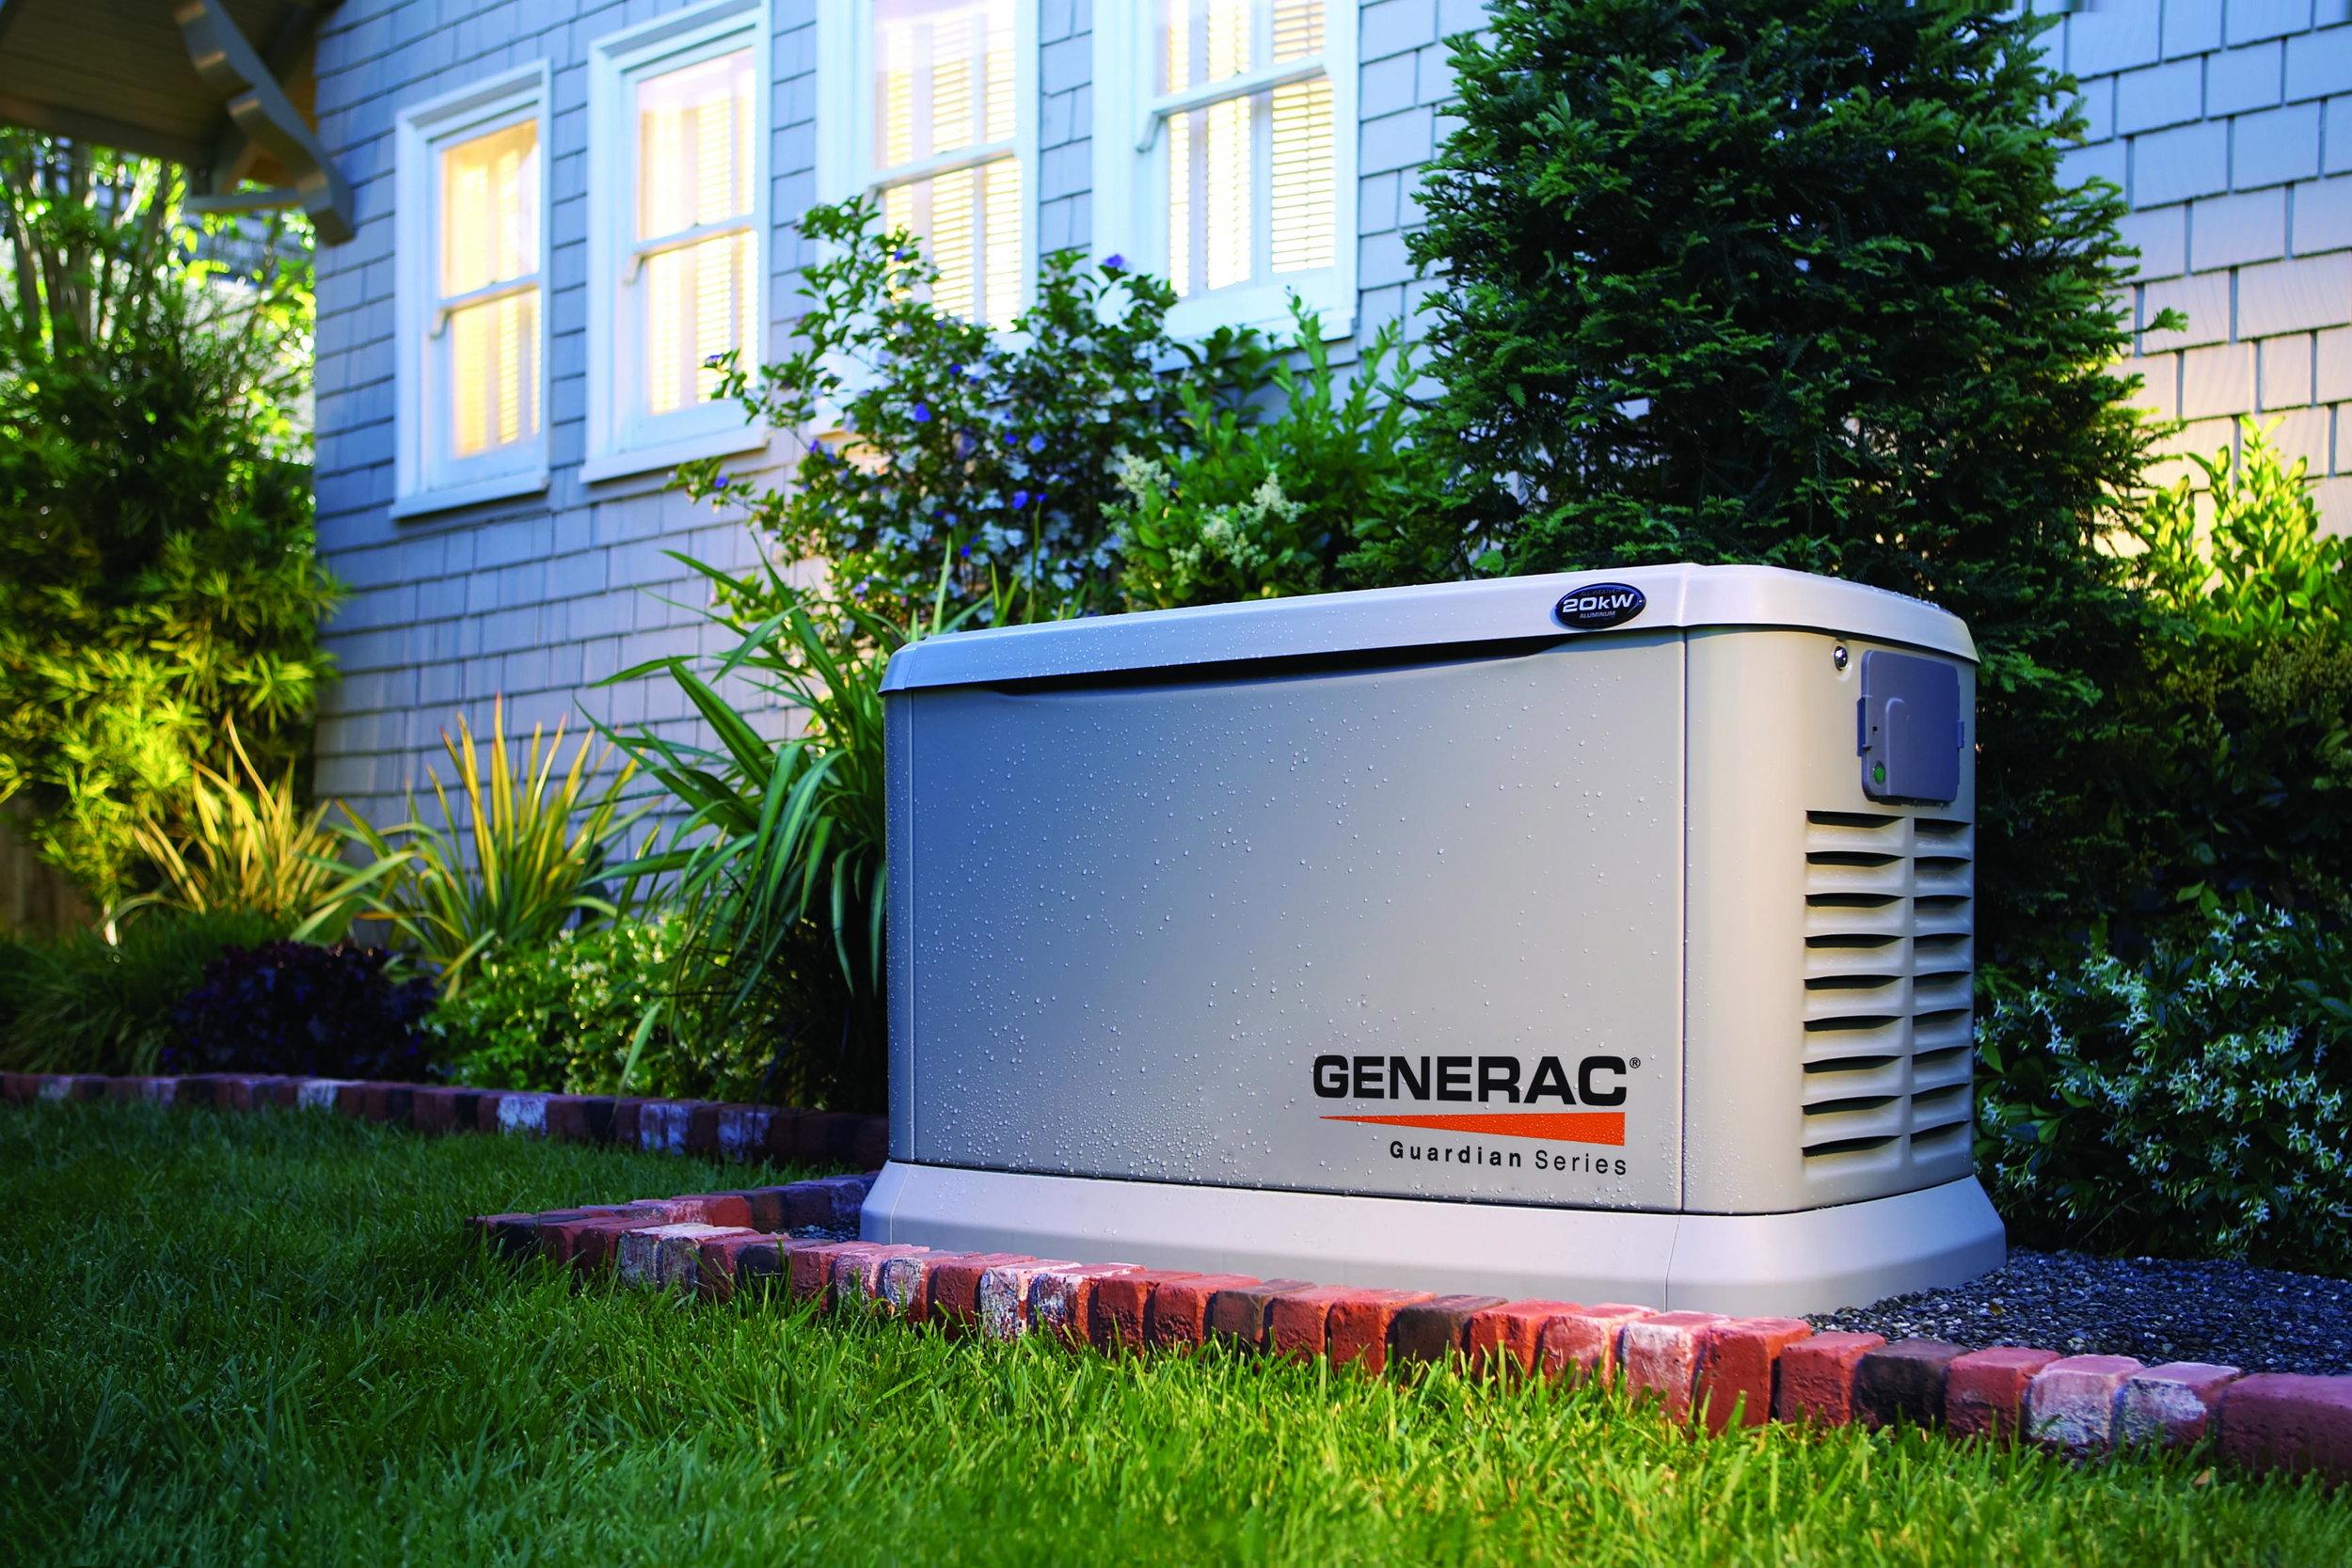 Generac Home Generator Installation Vancouver